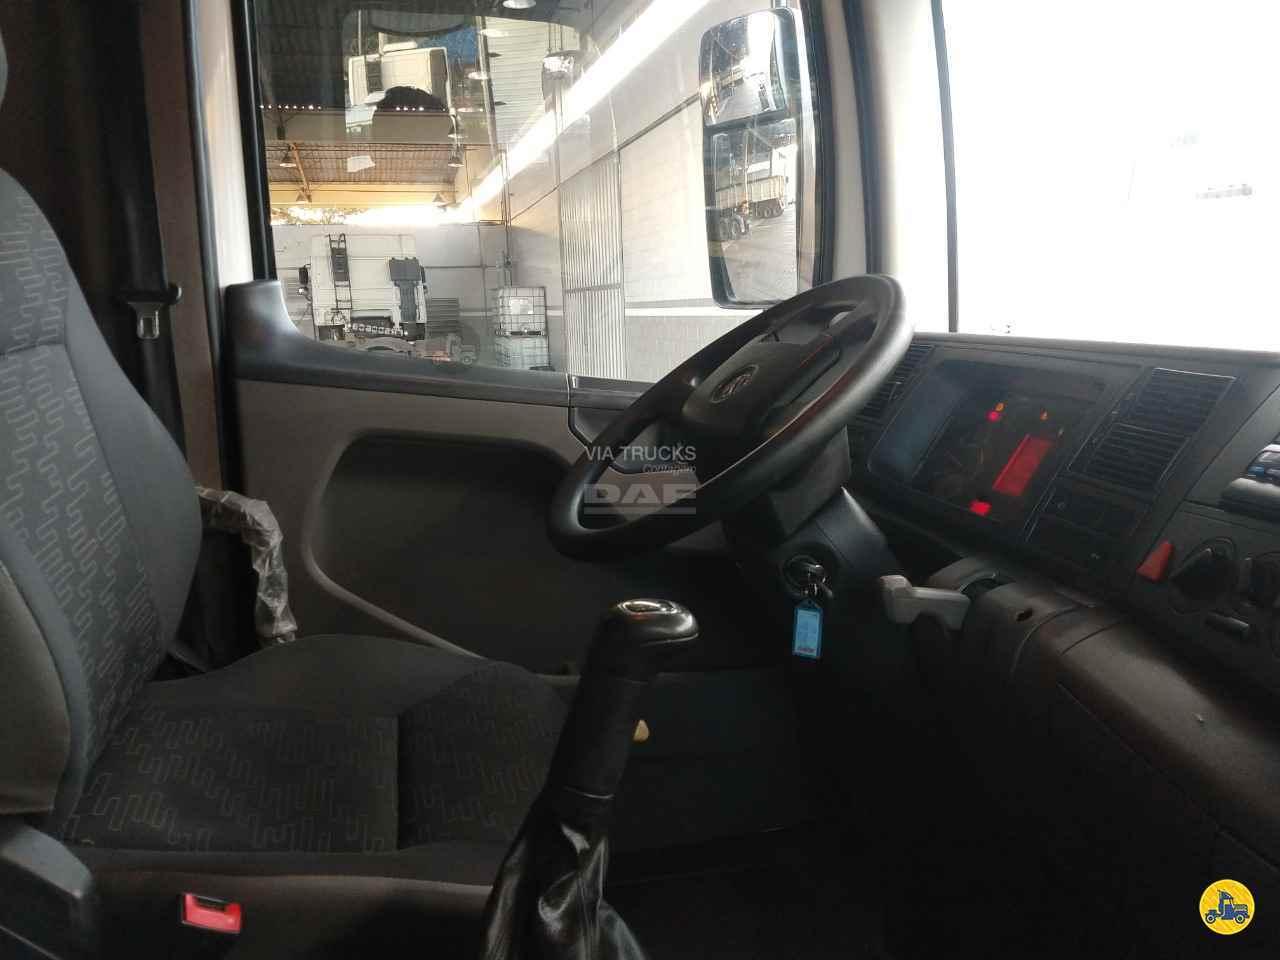 VOLKSWAGEN VW 24280 214877km 2014/2015 Via Trucks - DAF